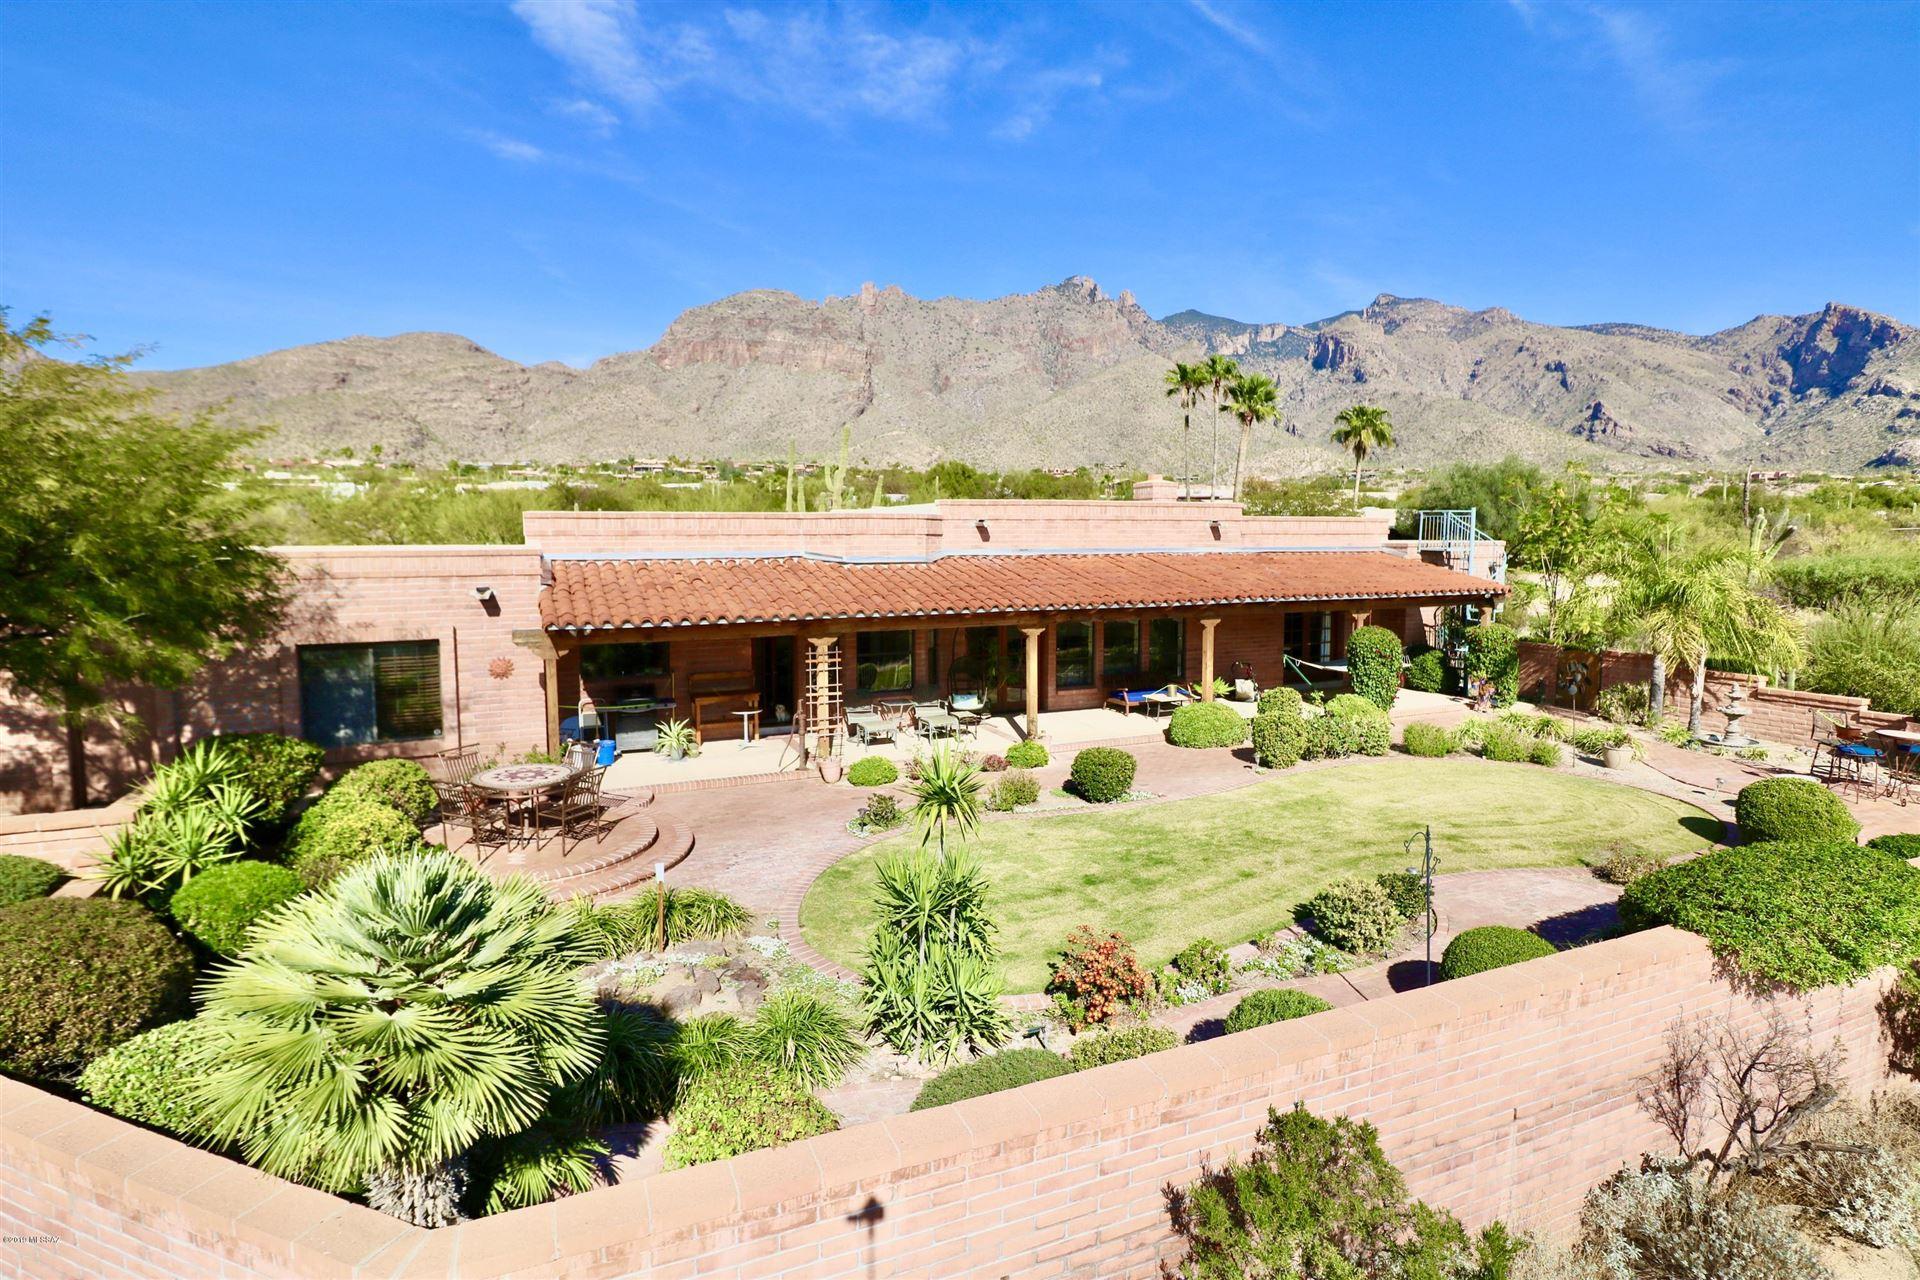 6946 N Pusch Peak Place, Tucson, AZ 85718 - MLS#: 22001062